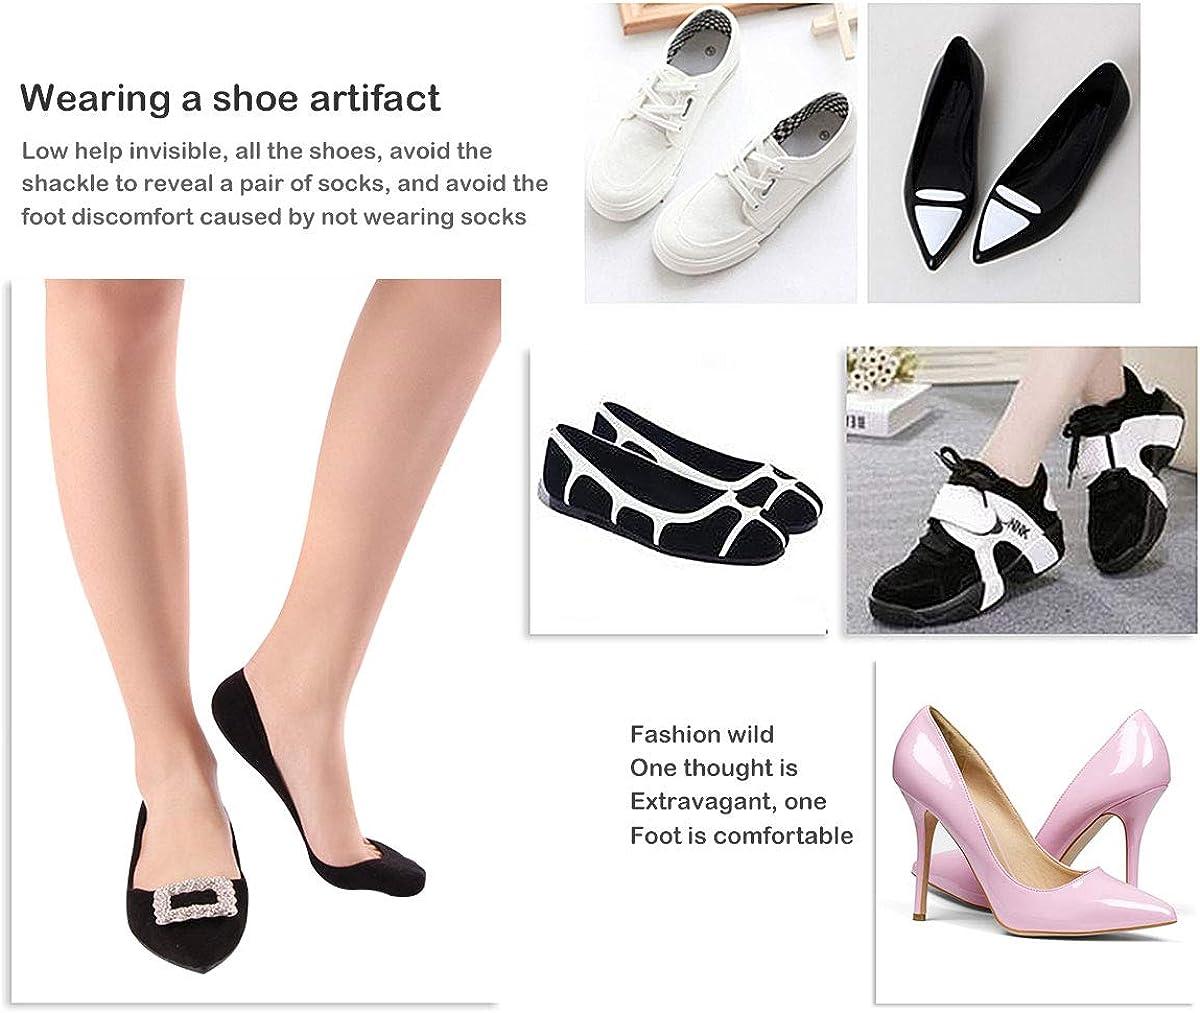 6//5 Pairs Women Low Socks Non-Slip No Show Ankle Socks Women Breathable Trainers Socks Sneaker Socks Women Invisible Ladies Shoe Socks Cotton Low Cut Socks